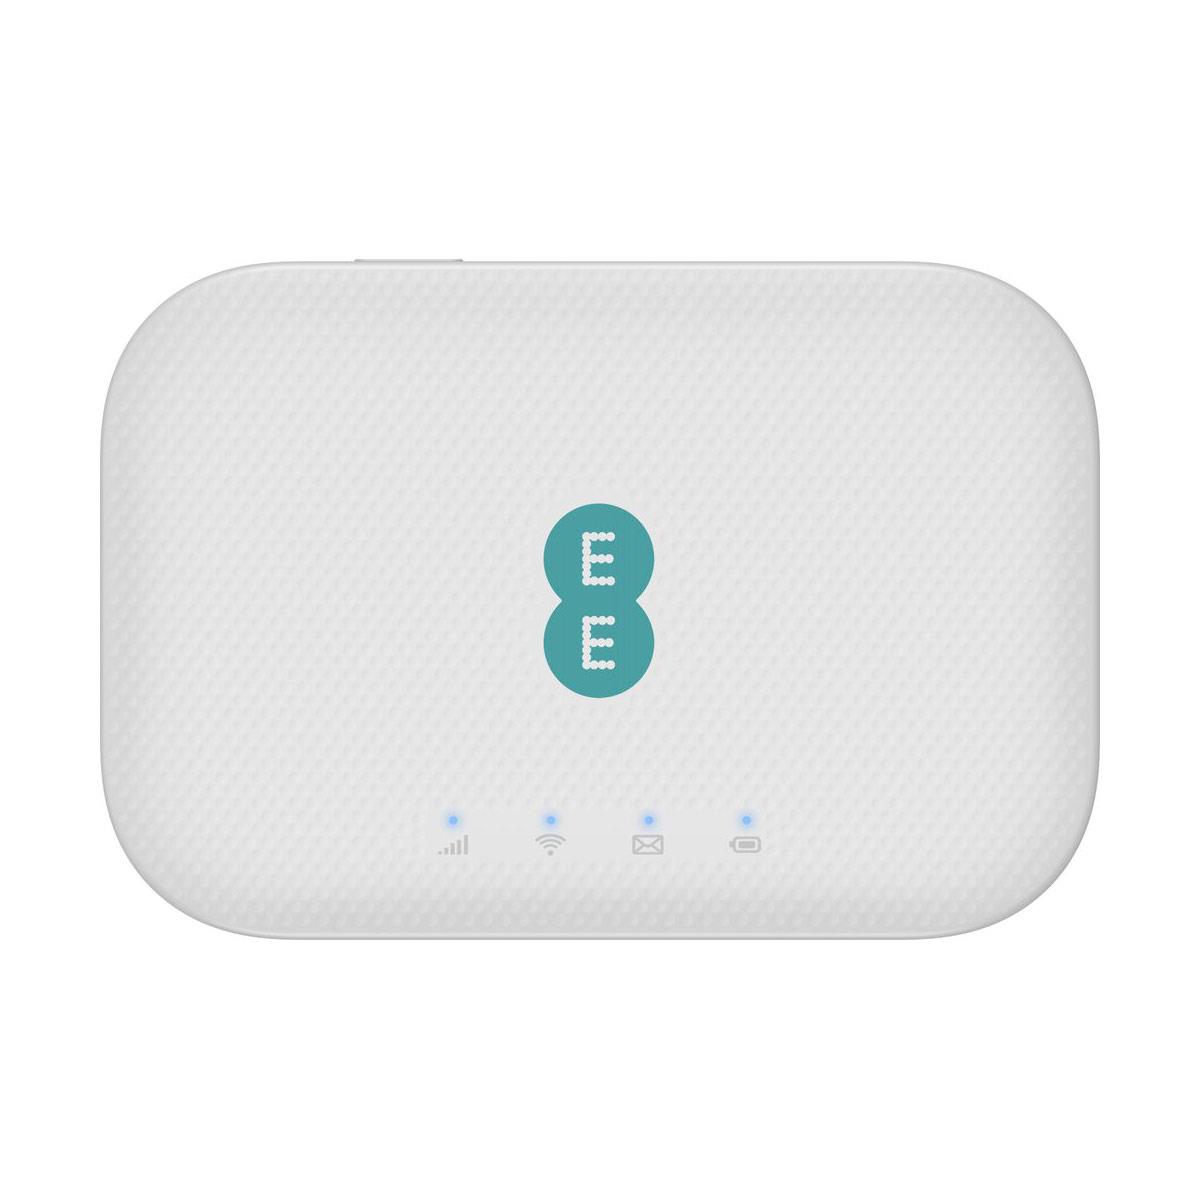 مودم 4.5G قابل حمل آلکاتل مدل EE71